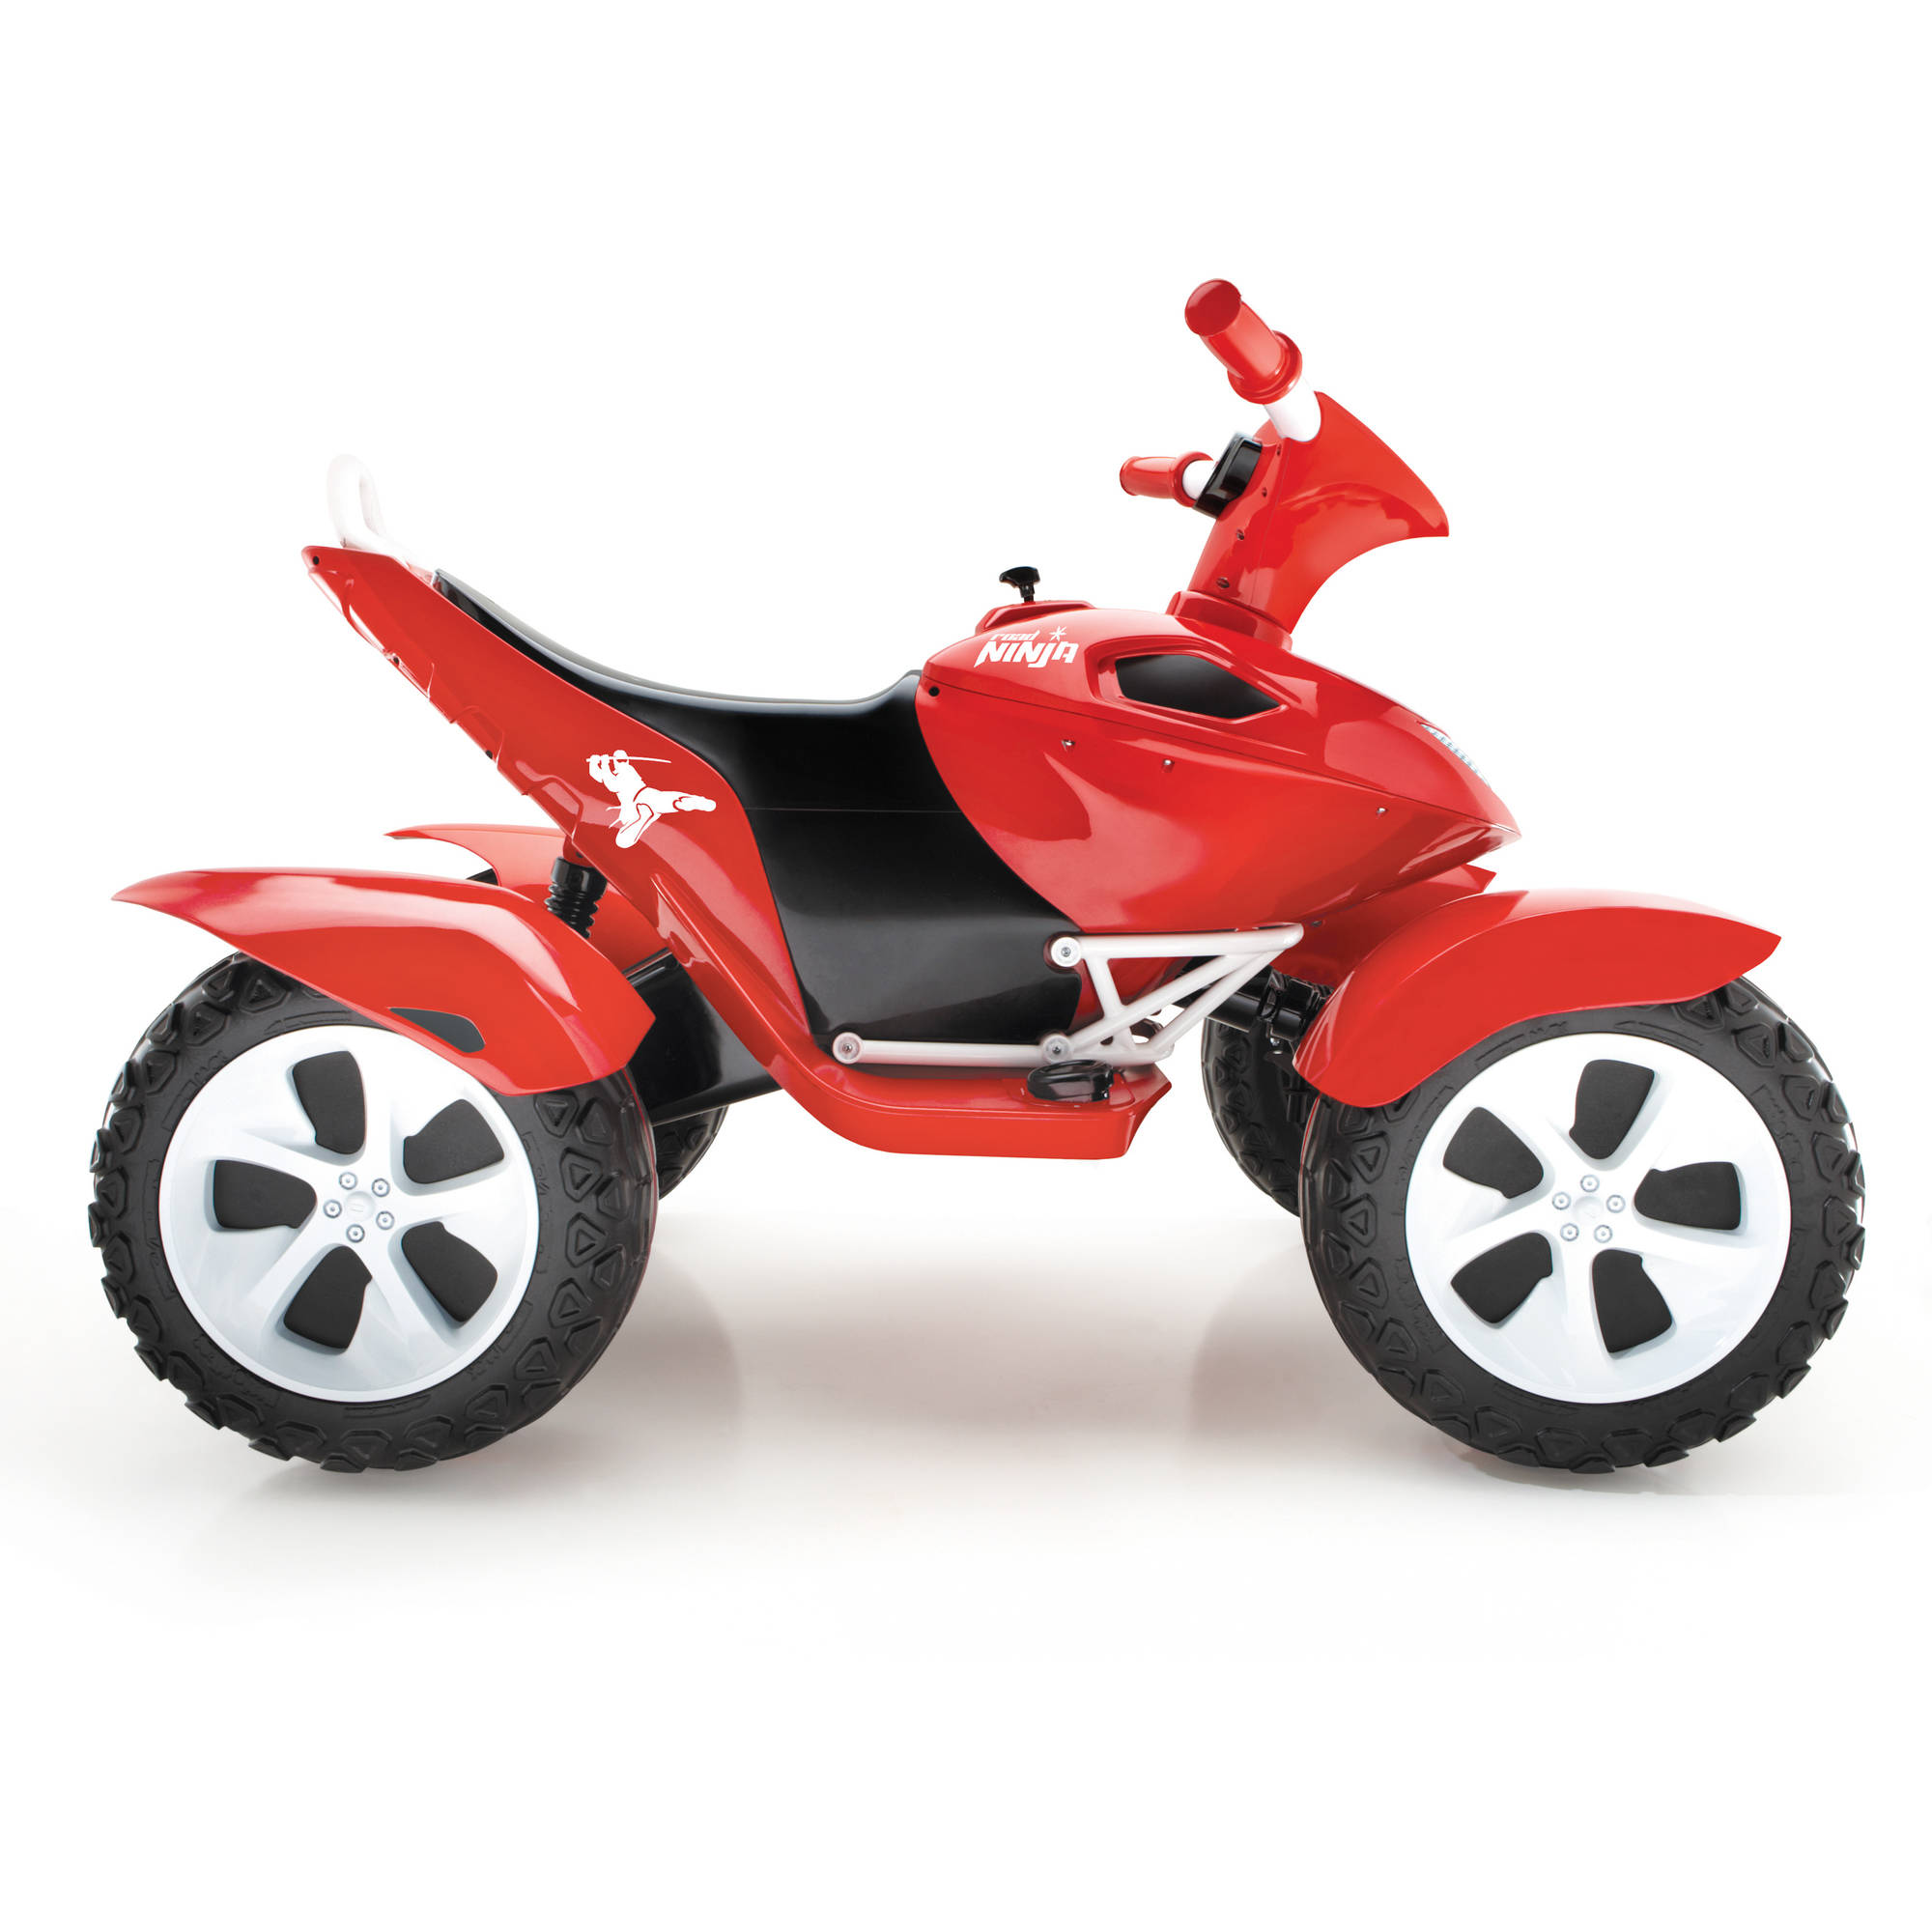 Little Tikes Road Ninja 12-Volt Battery-Powered Ride-On